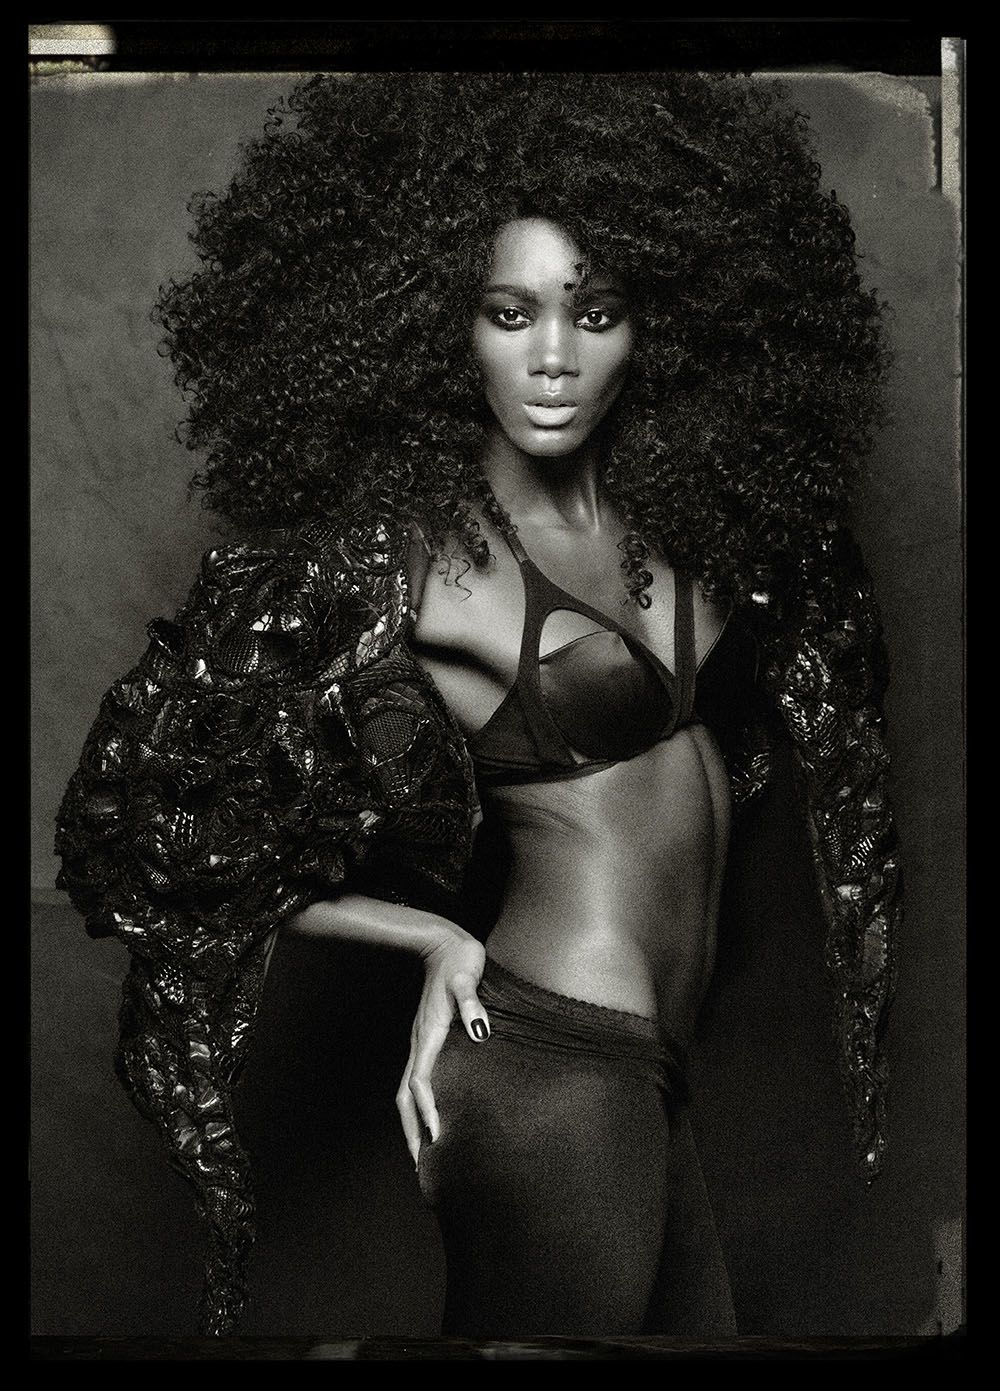 Black fire stella vaudran for oob magazine online black x white natural hair styles black - Porno dive anni 90 ...